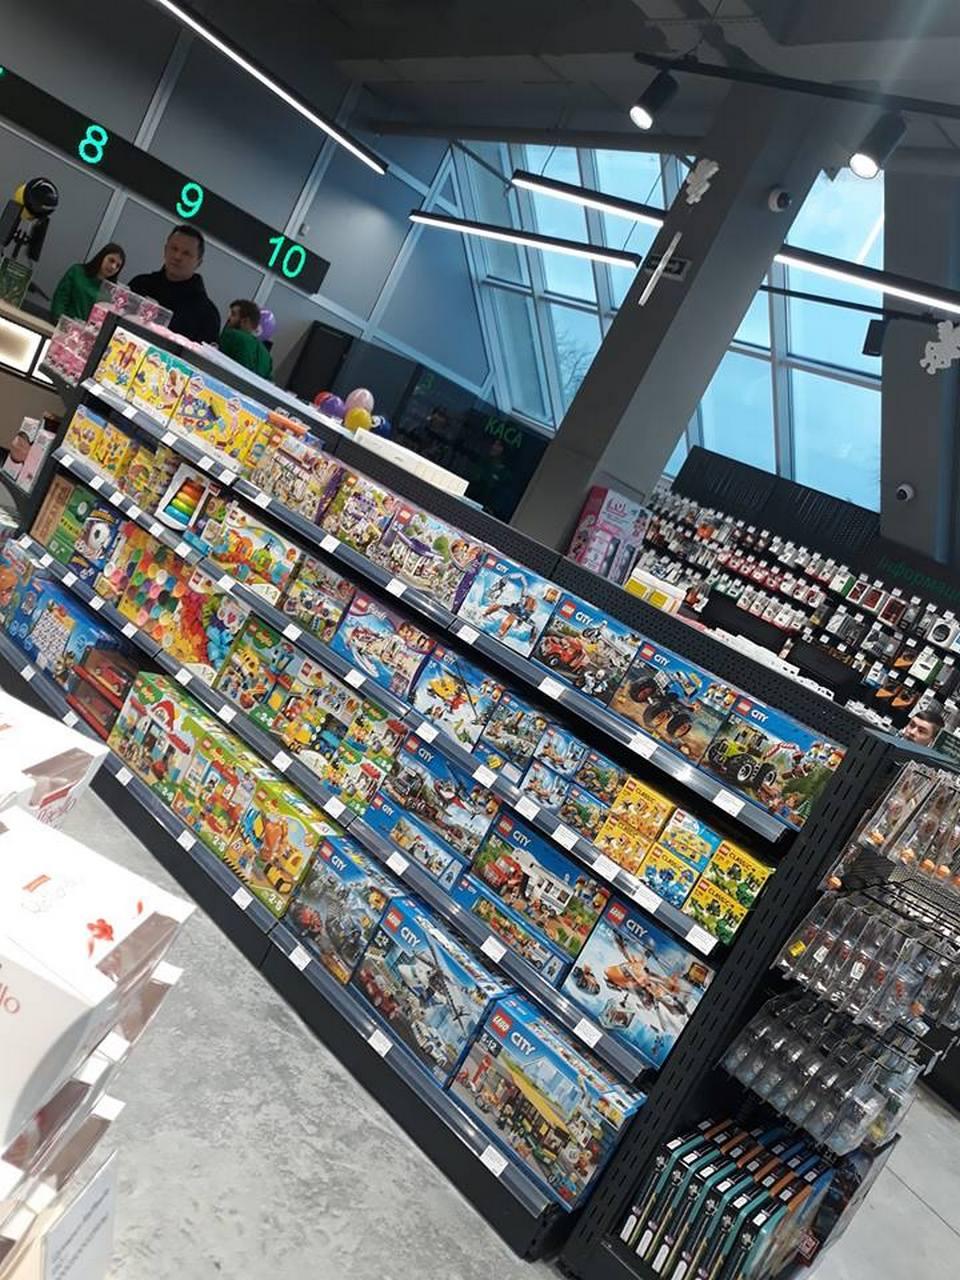 70b99baeebe0e Как выглядит новый магазин Rozetka в Киеве на улице Киото (+фото)